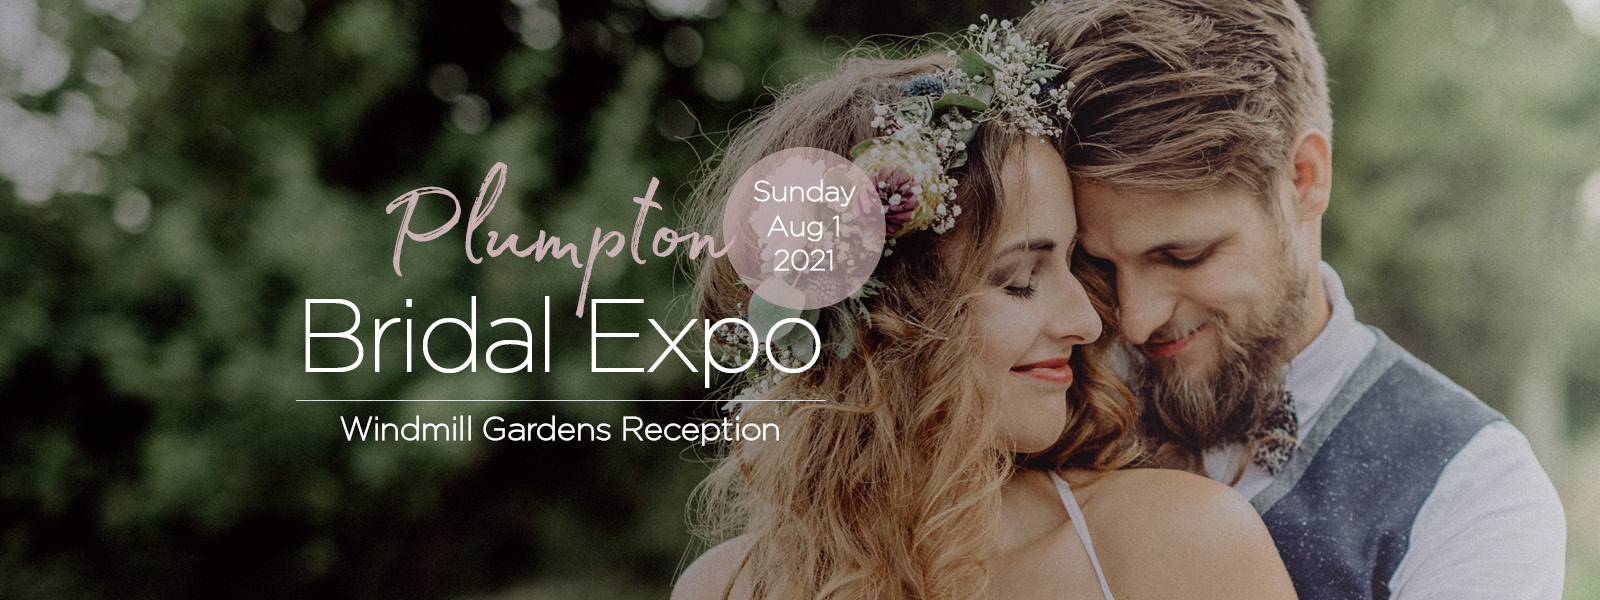 Plumpton Bridal Expo - 1 August 2021